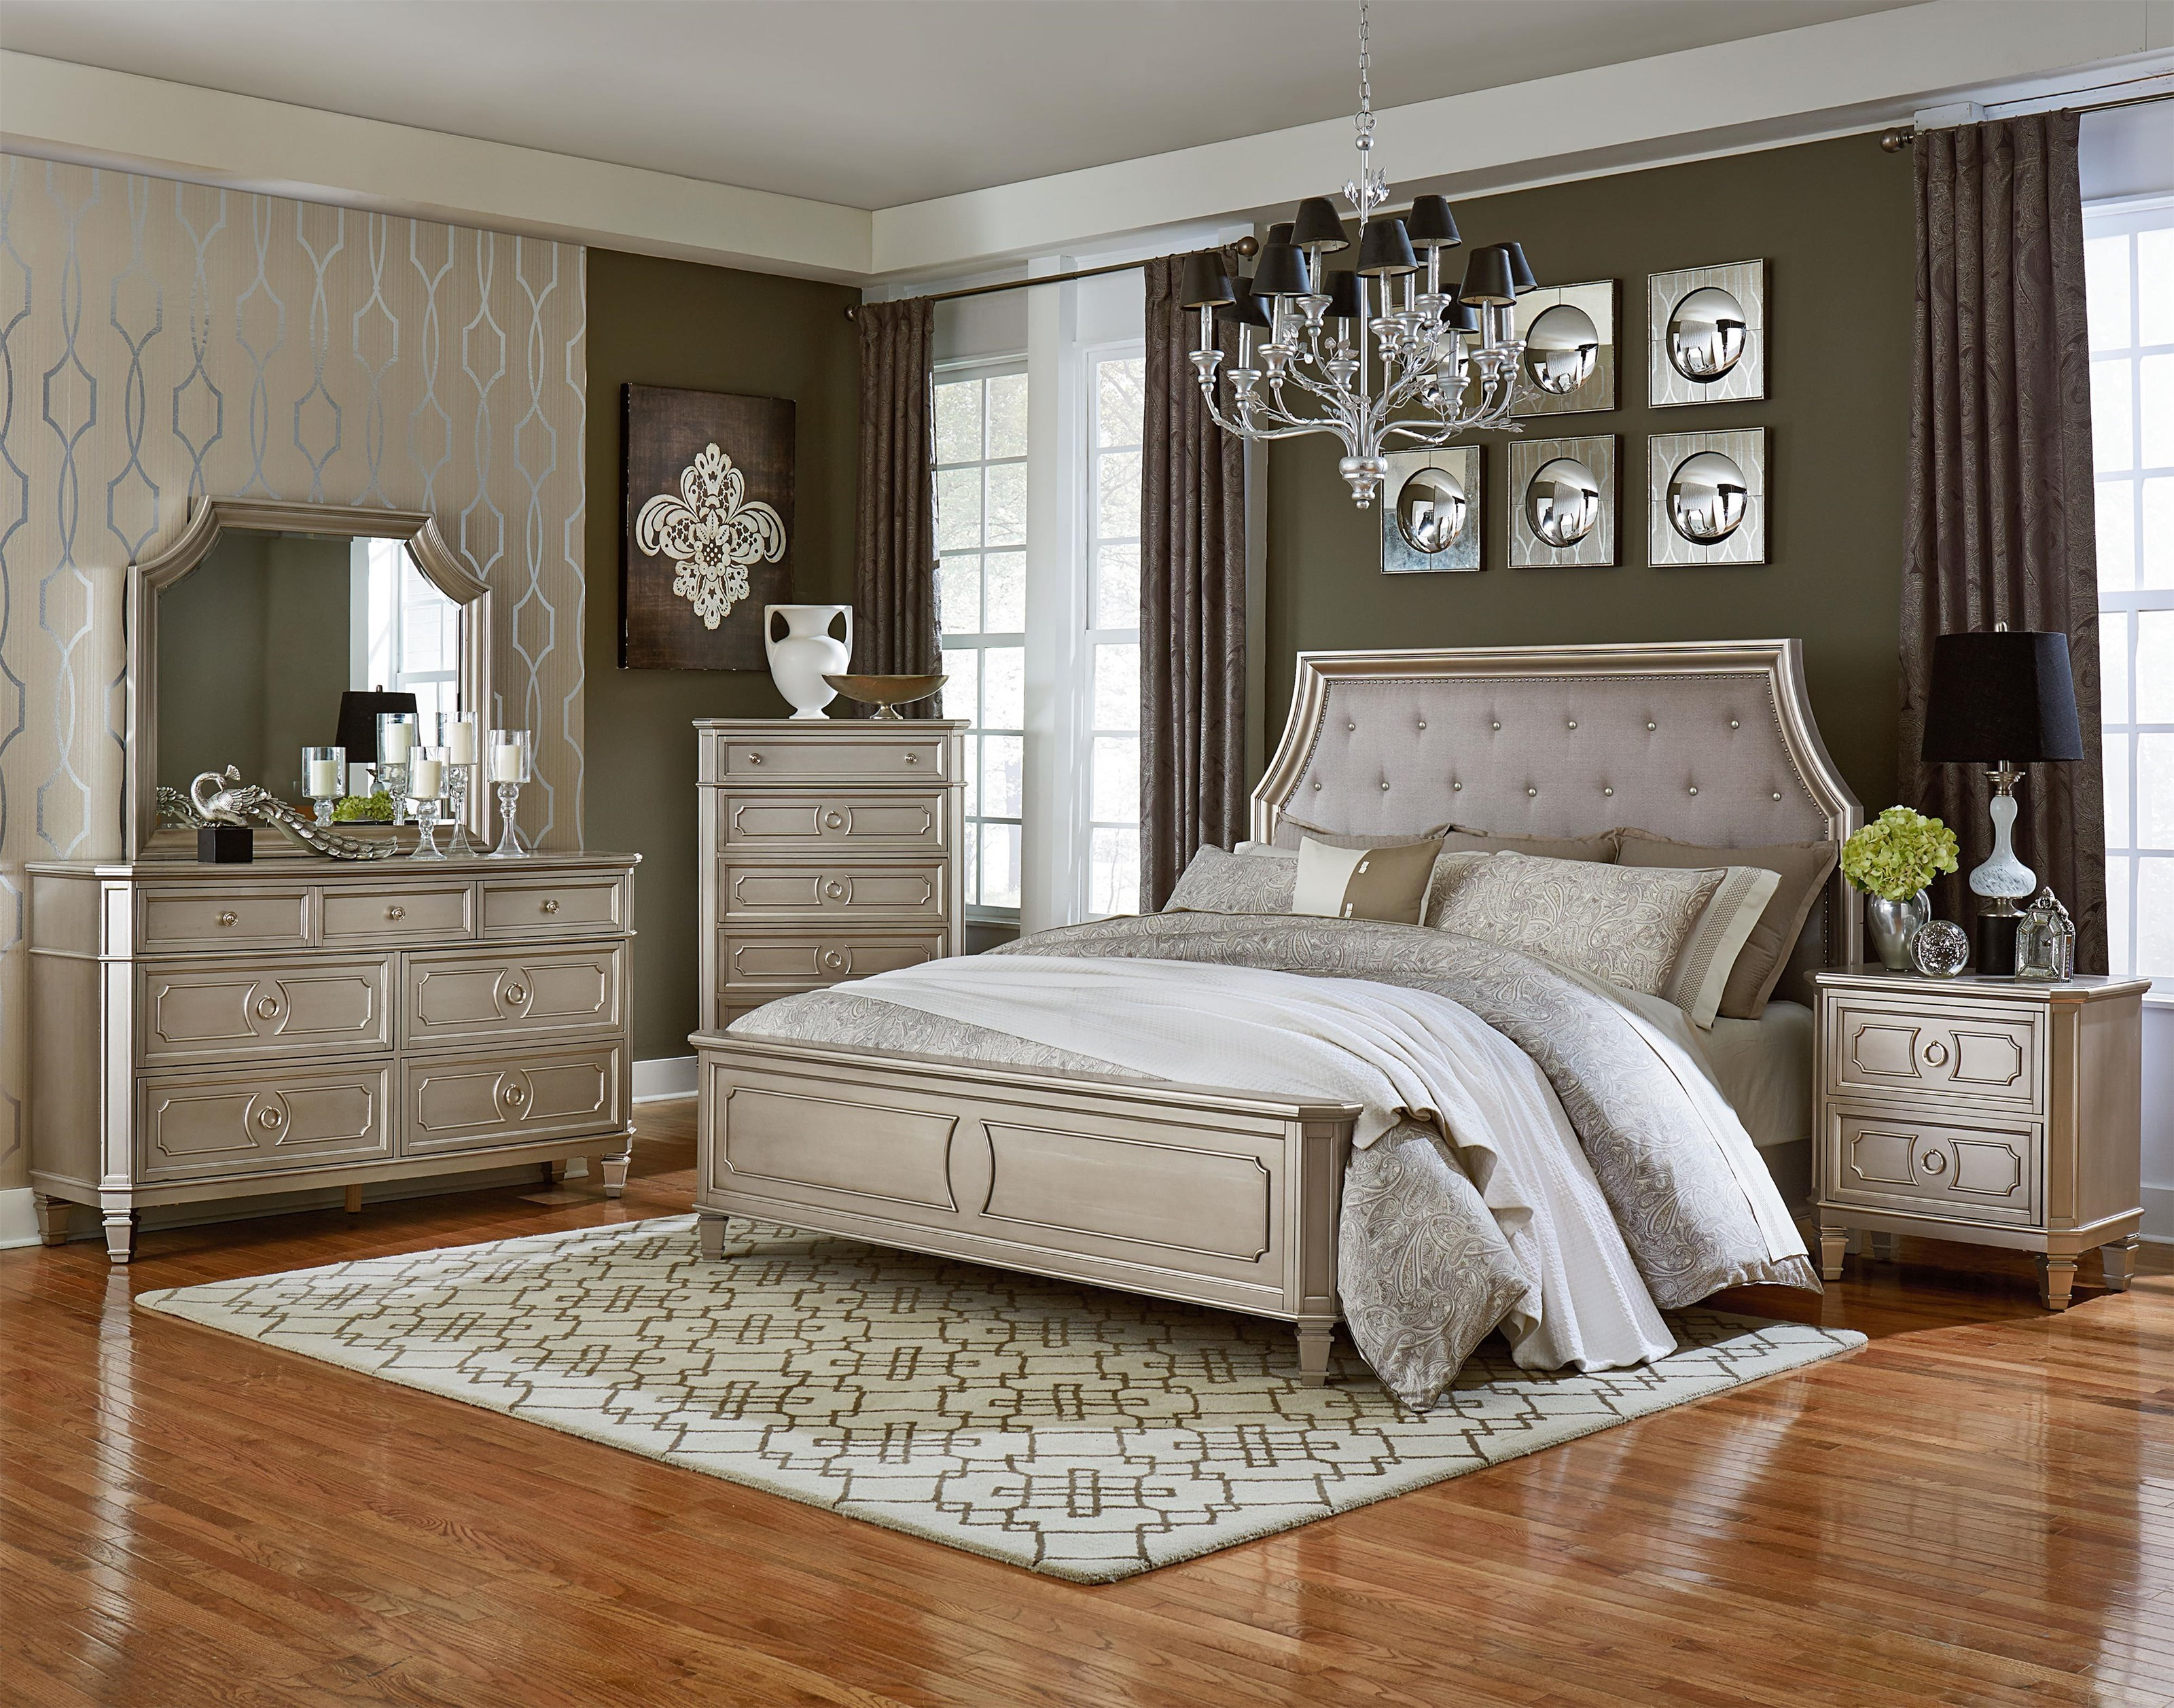 Standard Furniture Windsor Silver King Panel Bed, Dresser, Mirror U0026  Nightstand   Great American Home Store   Bedroom Groups